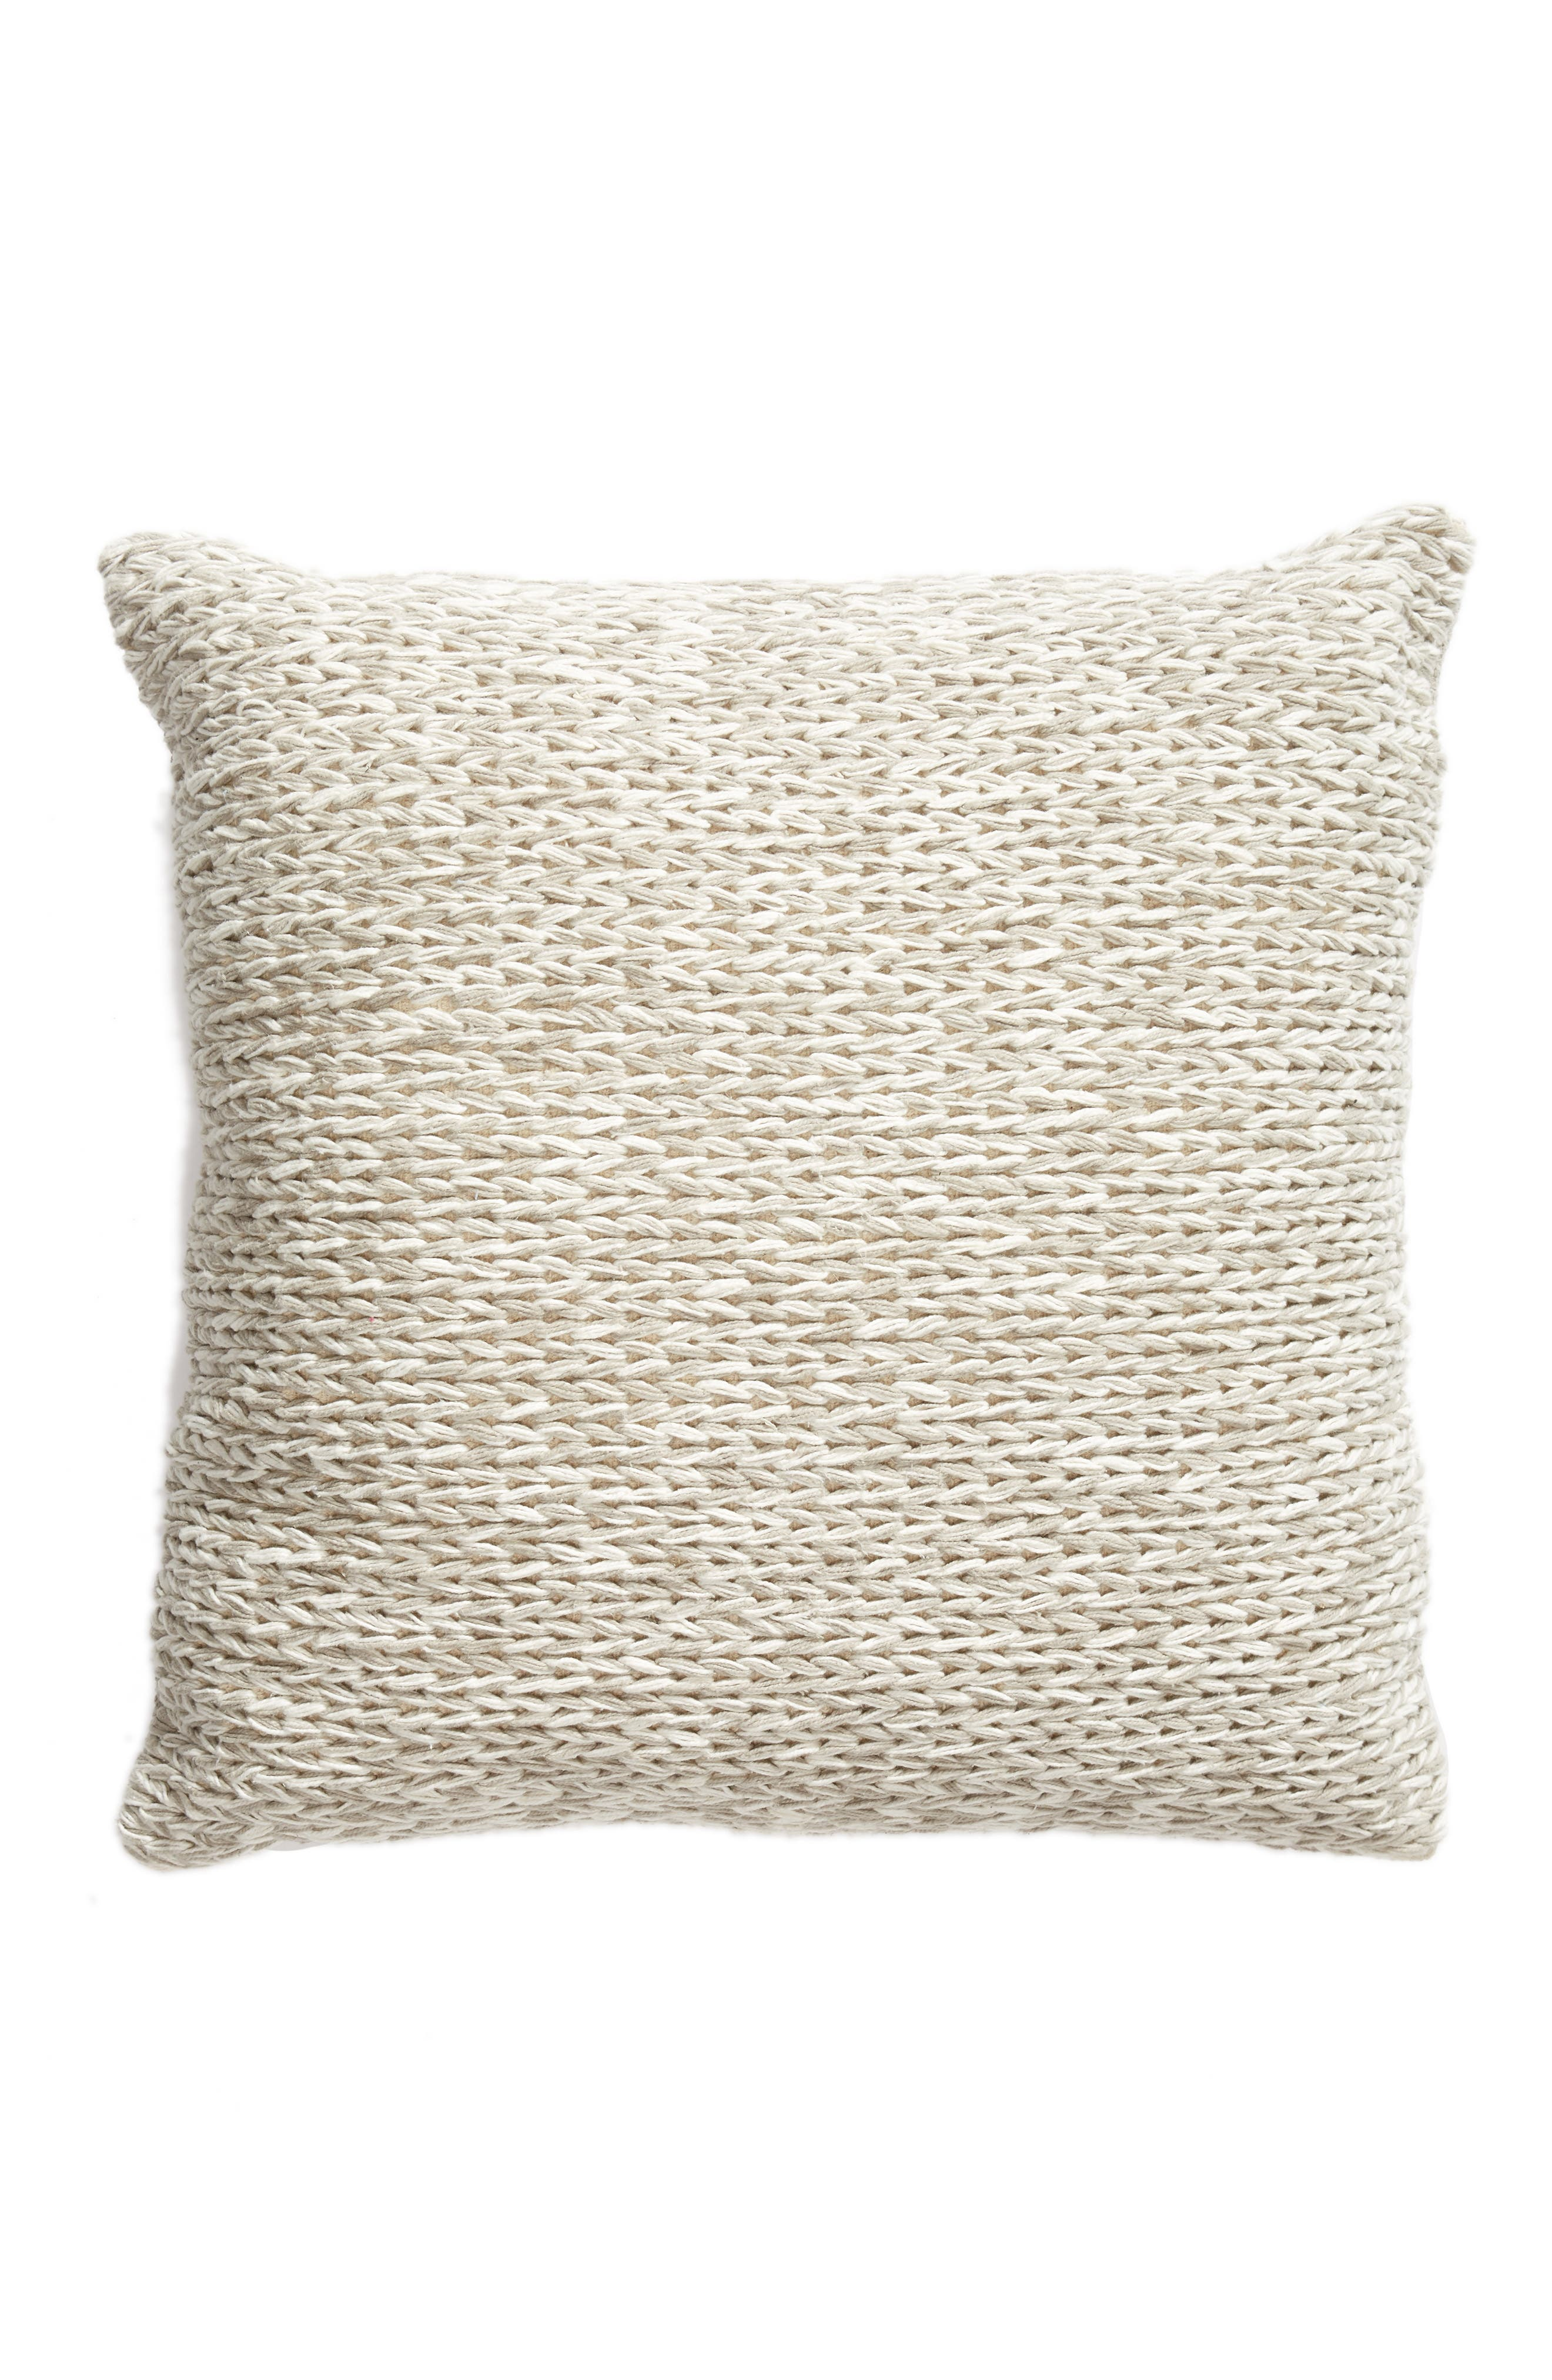 Knit Floor Pillow,                         Main,                         color, Grey Owl